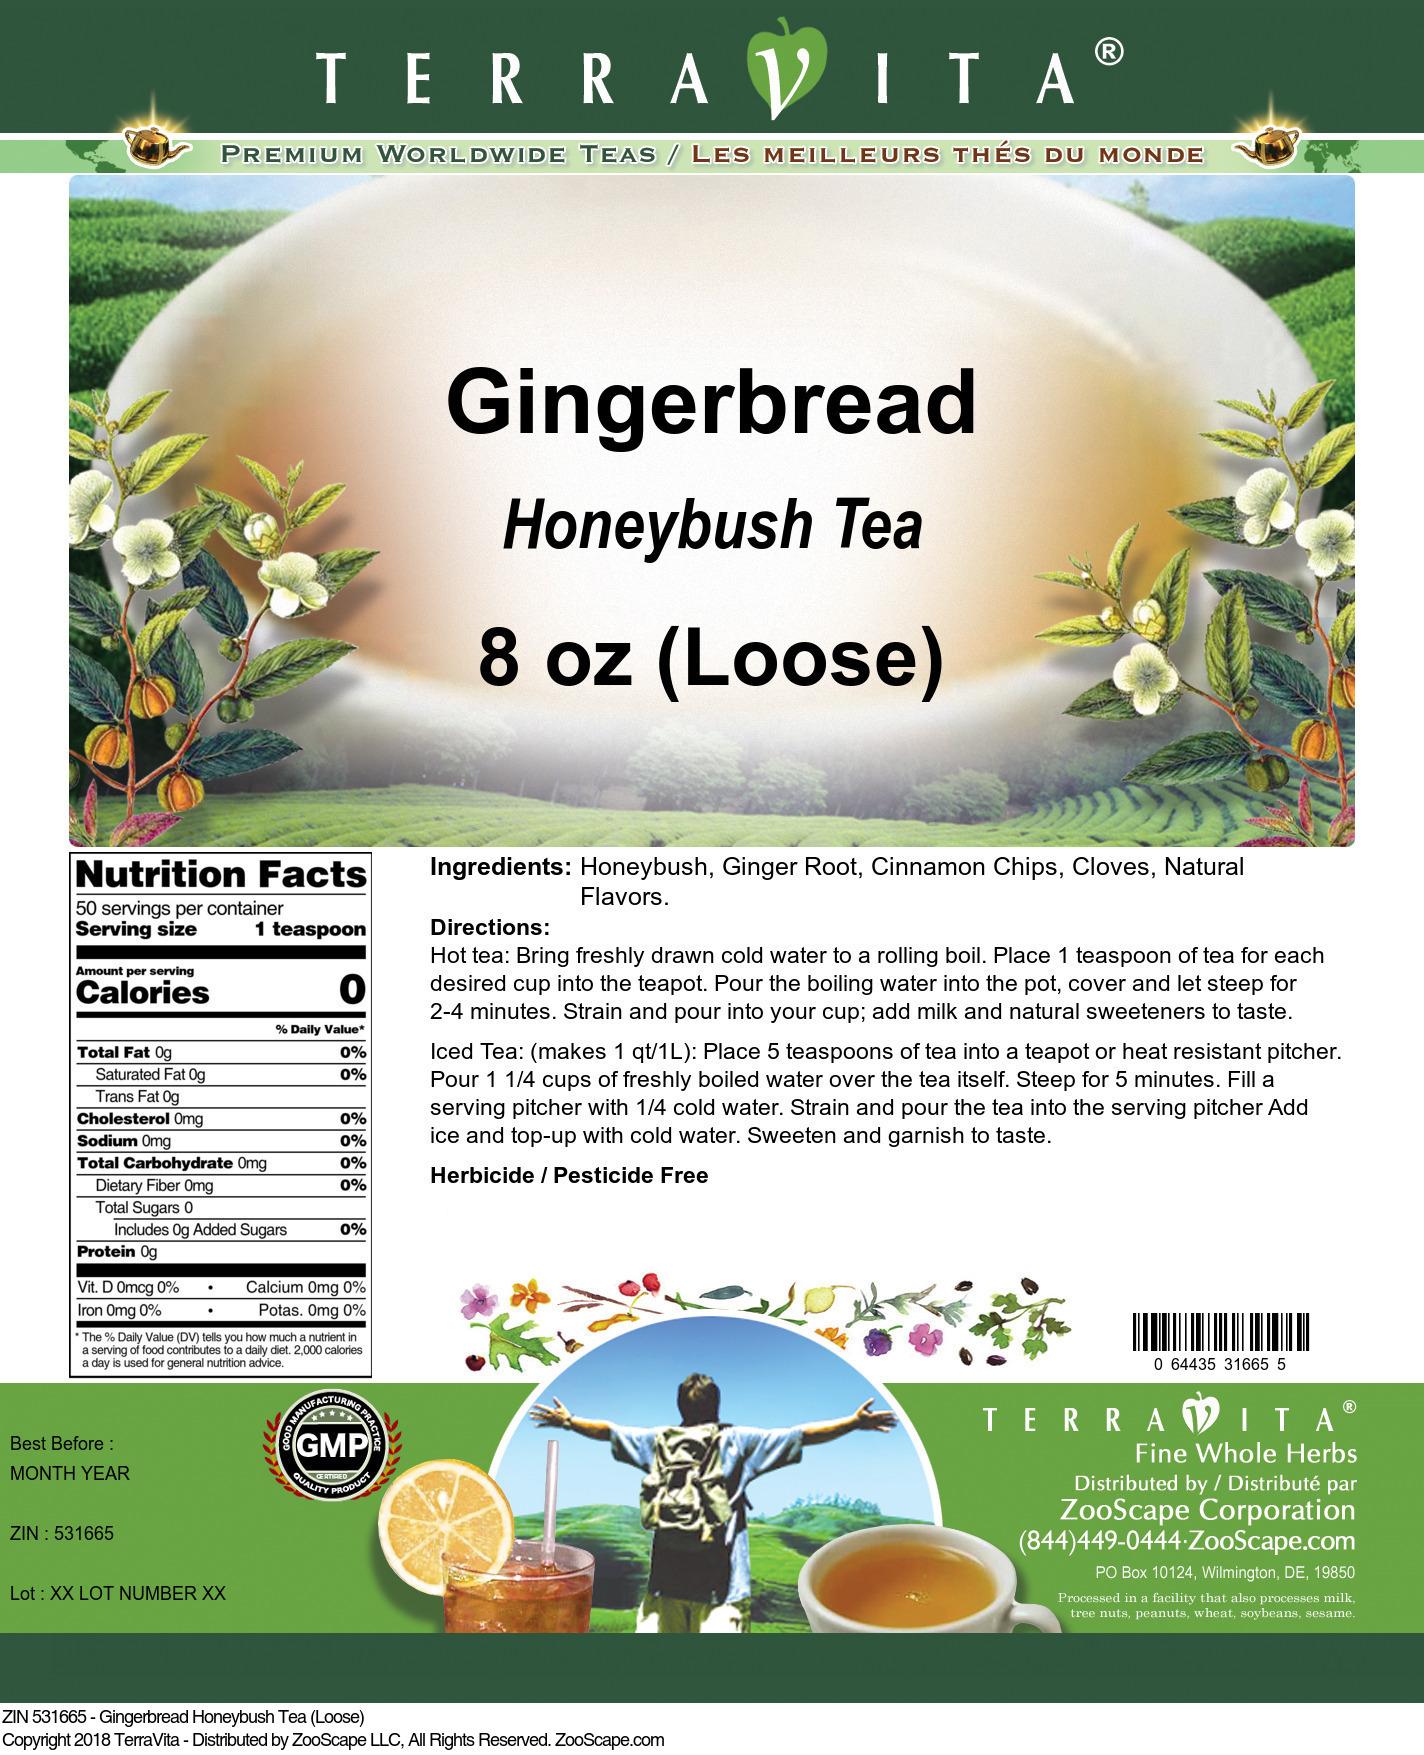 Gingerbread Honeybush Tea